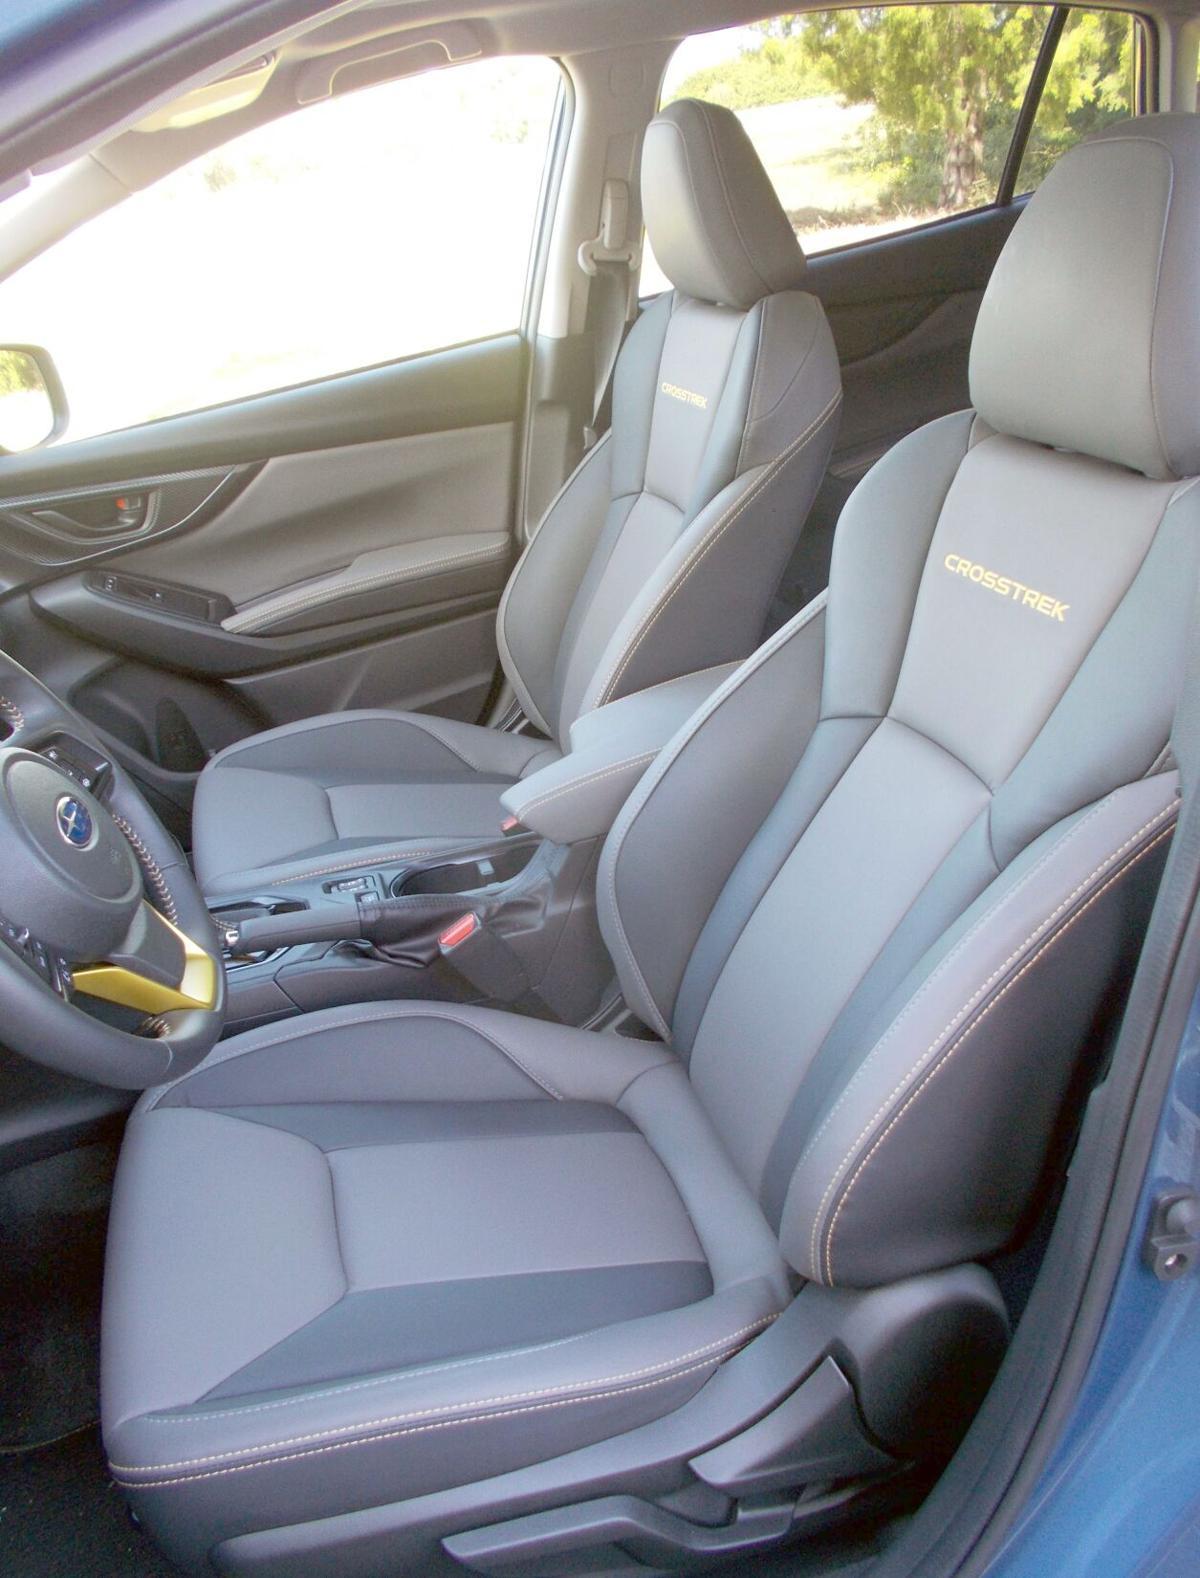 2021 Subaru Crosstrek front seating.jpg